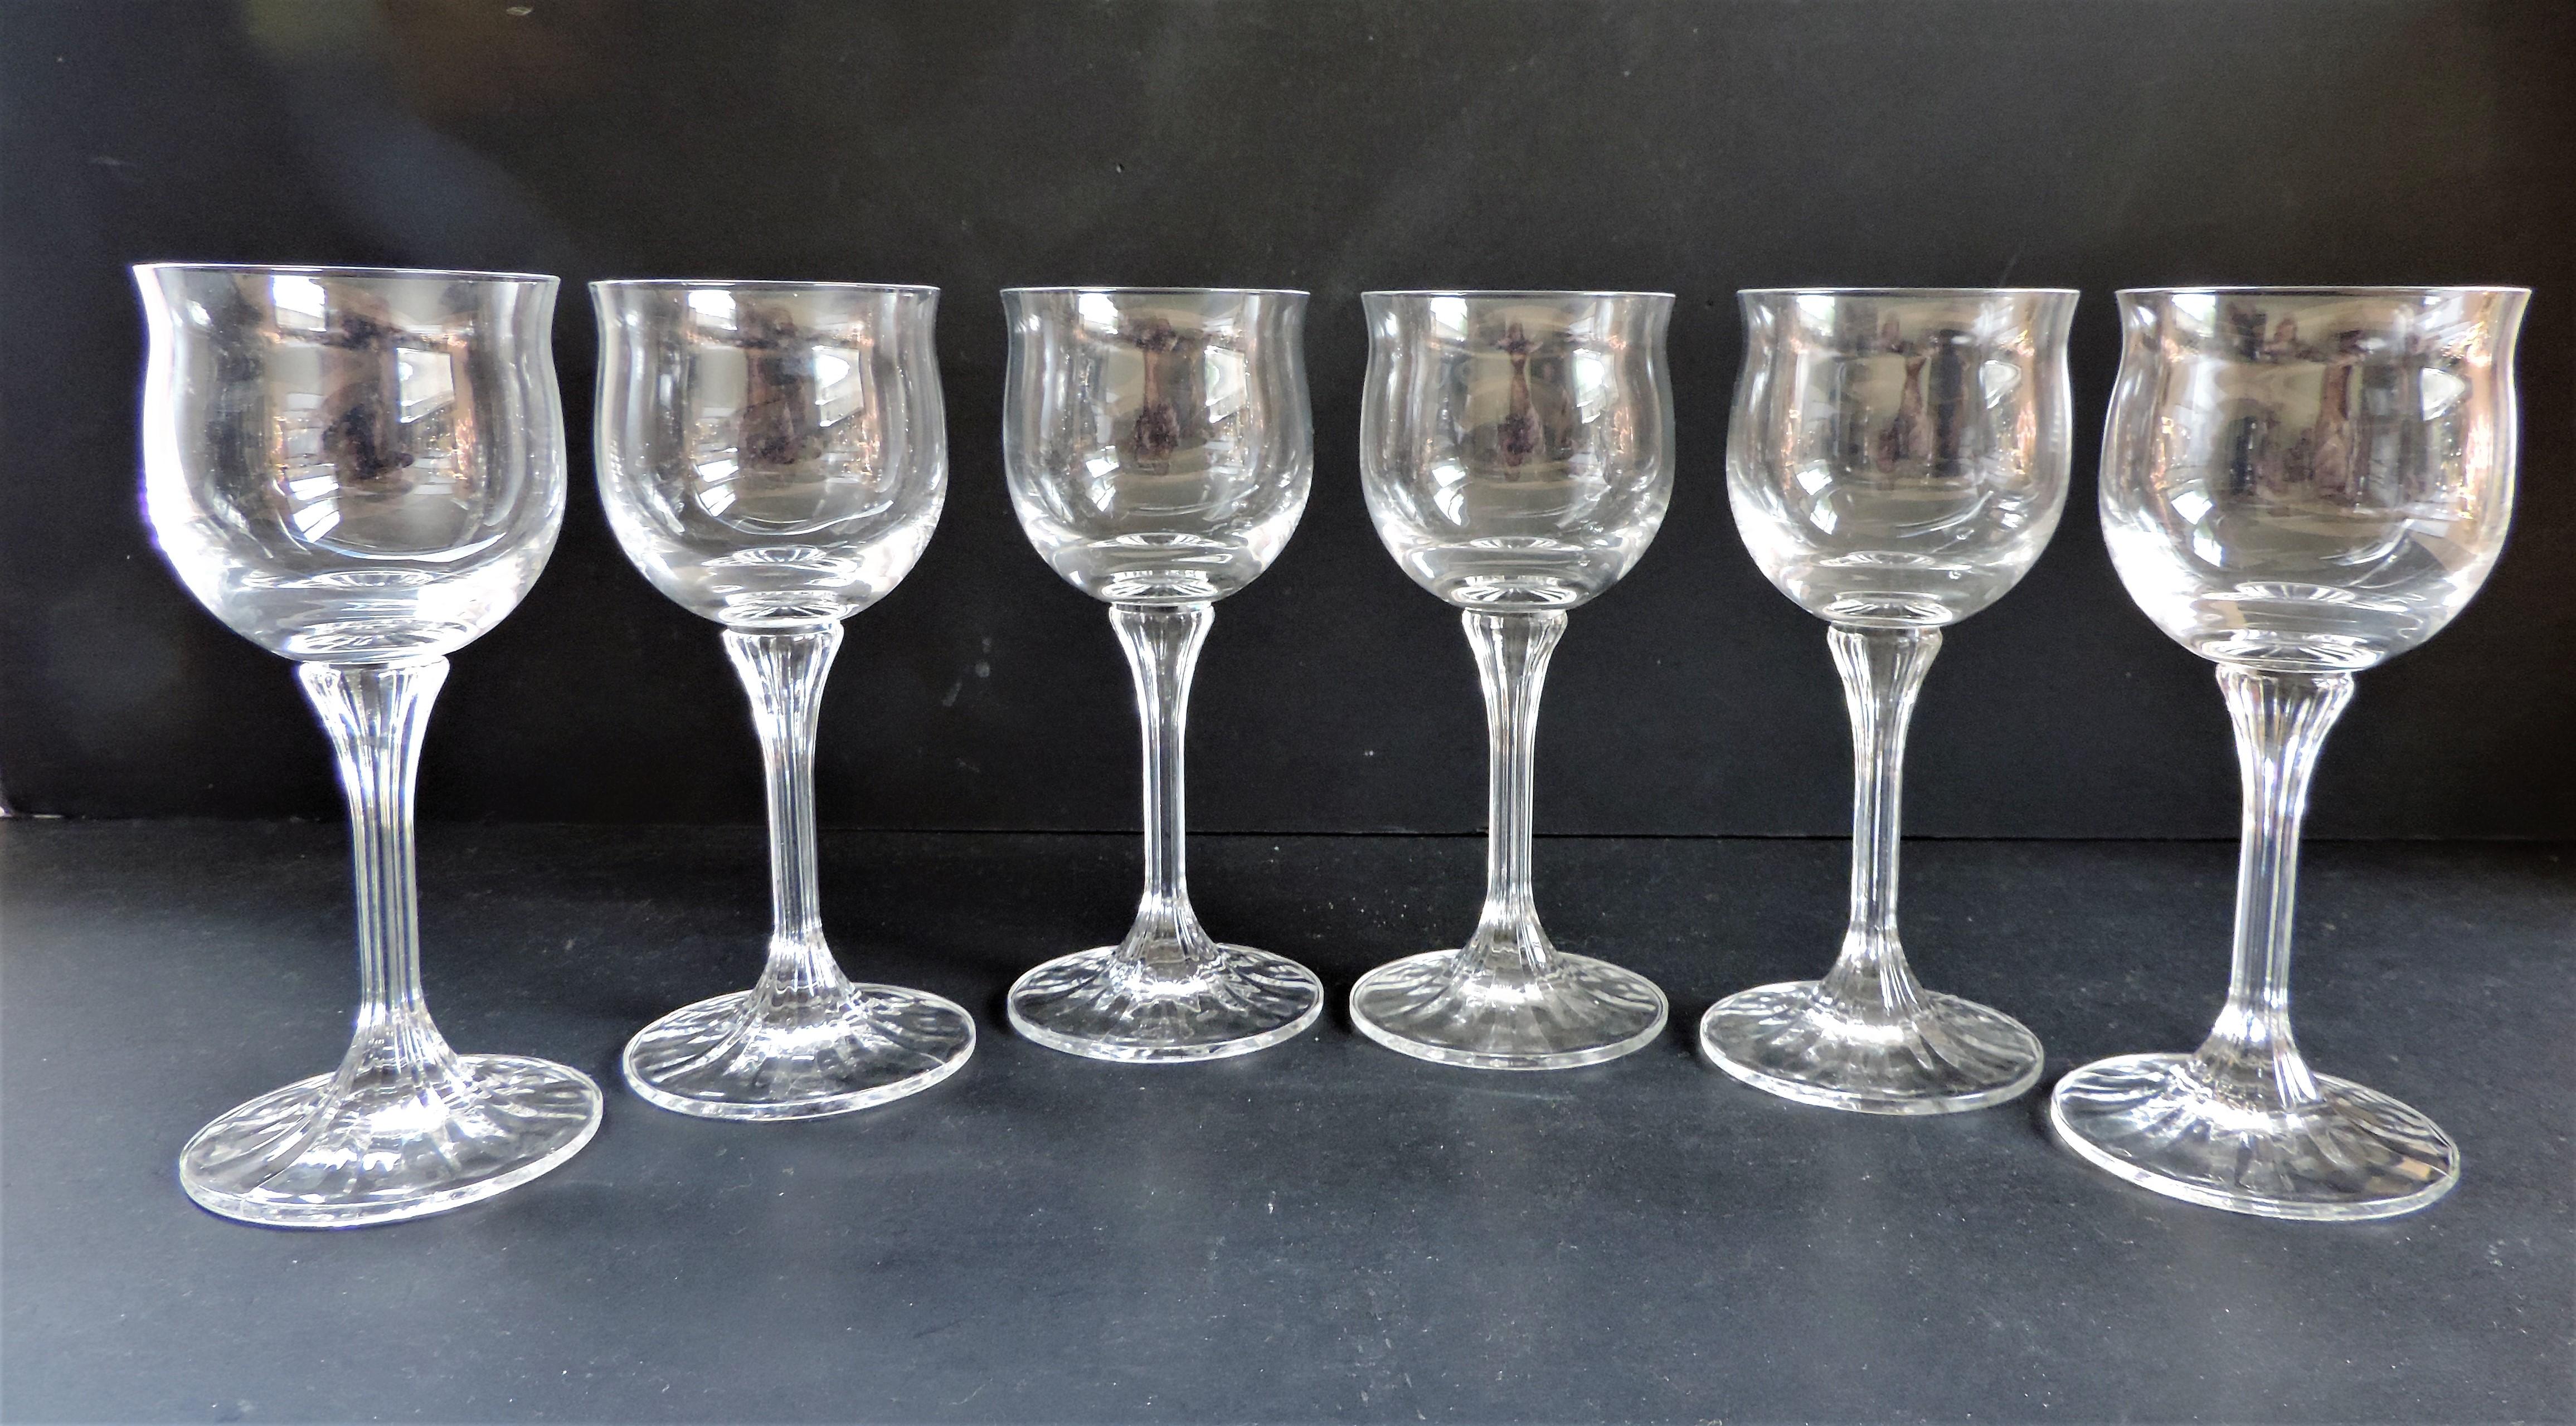 Set 6 Crystal Wine Glasses - Image 3 of 4